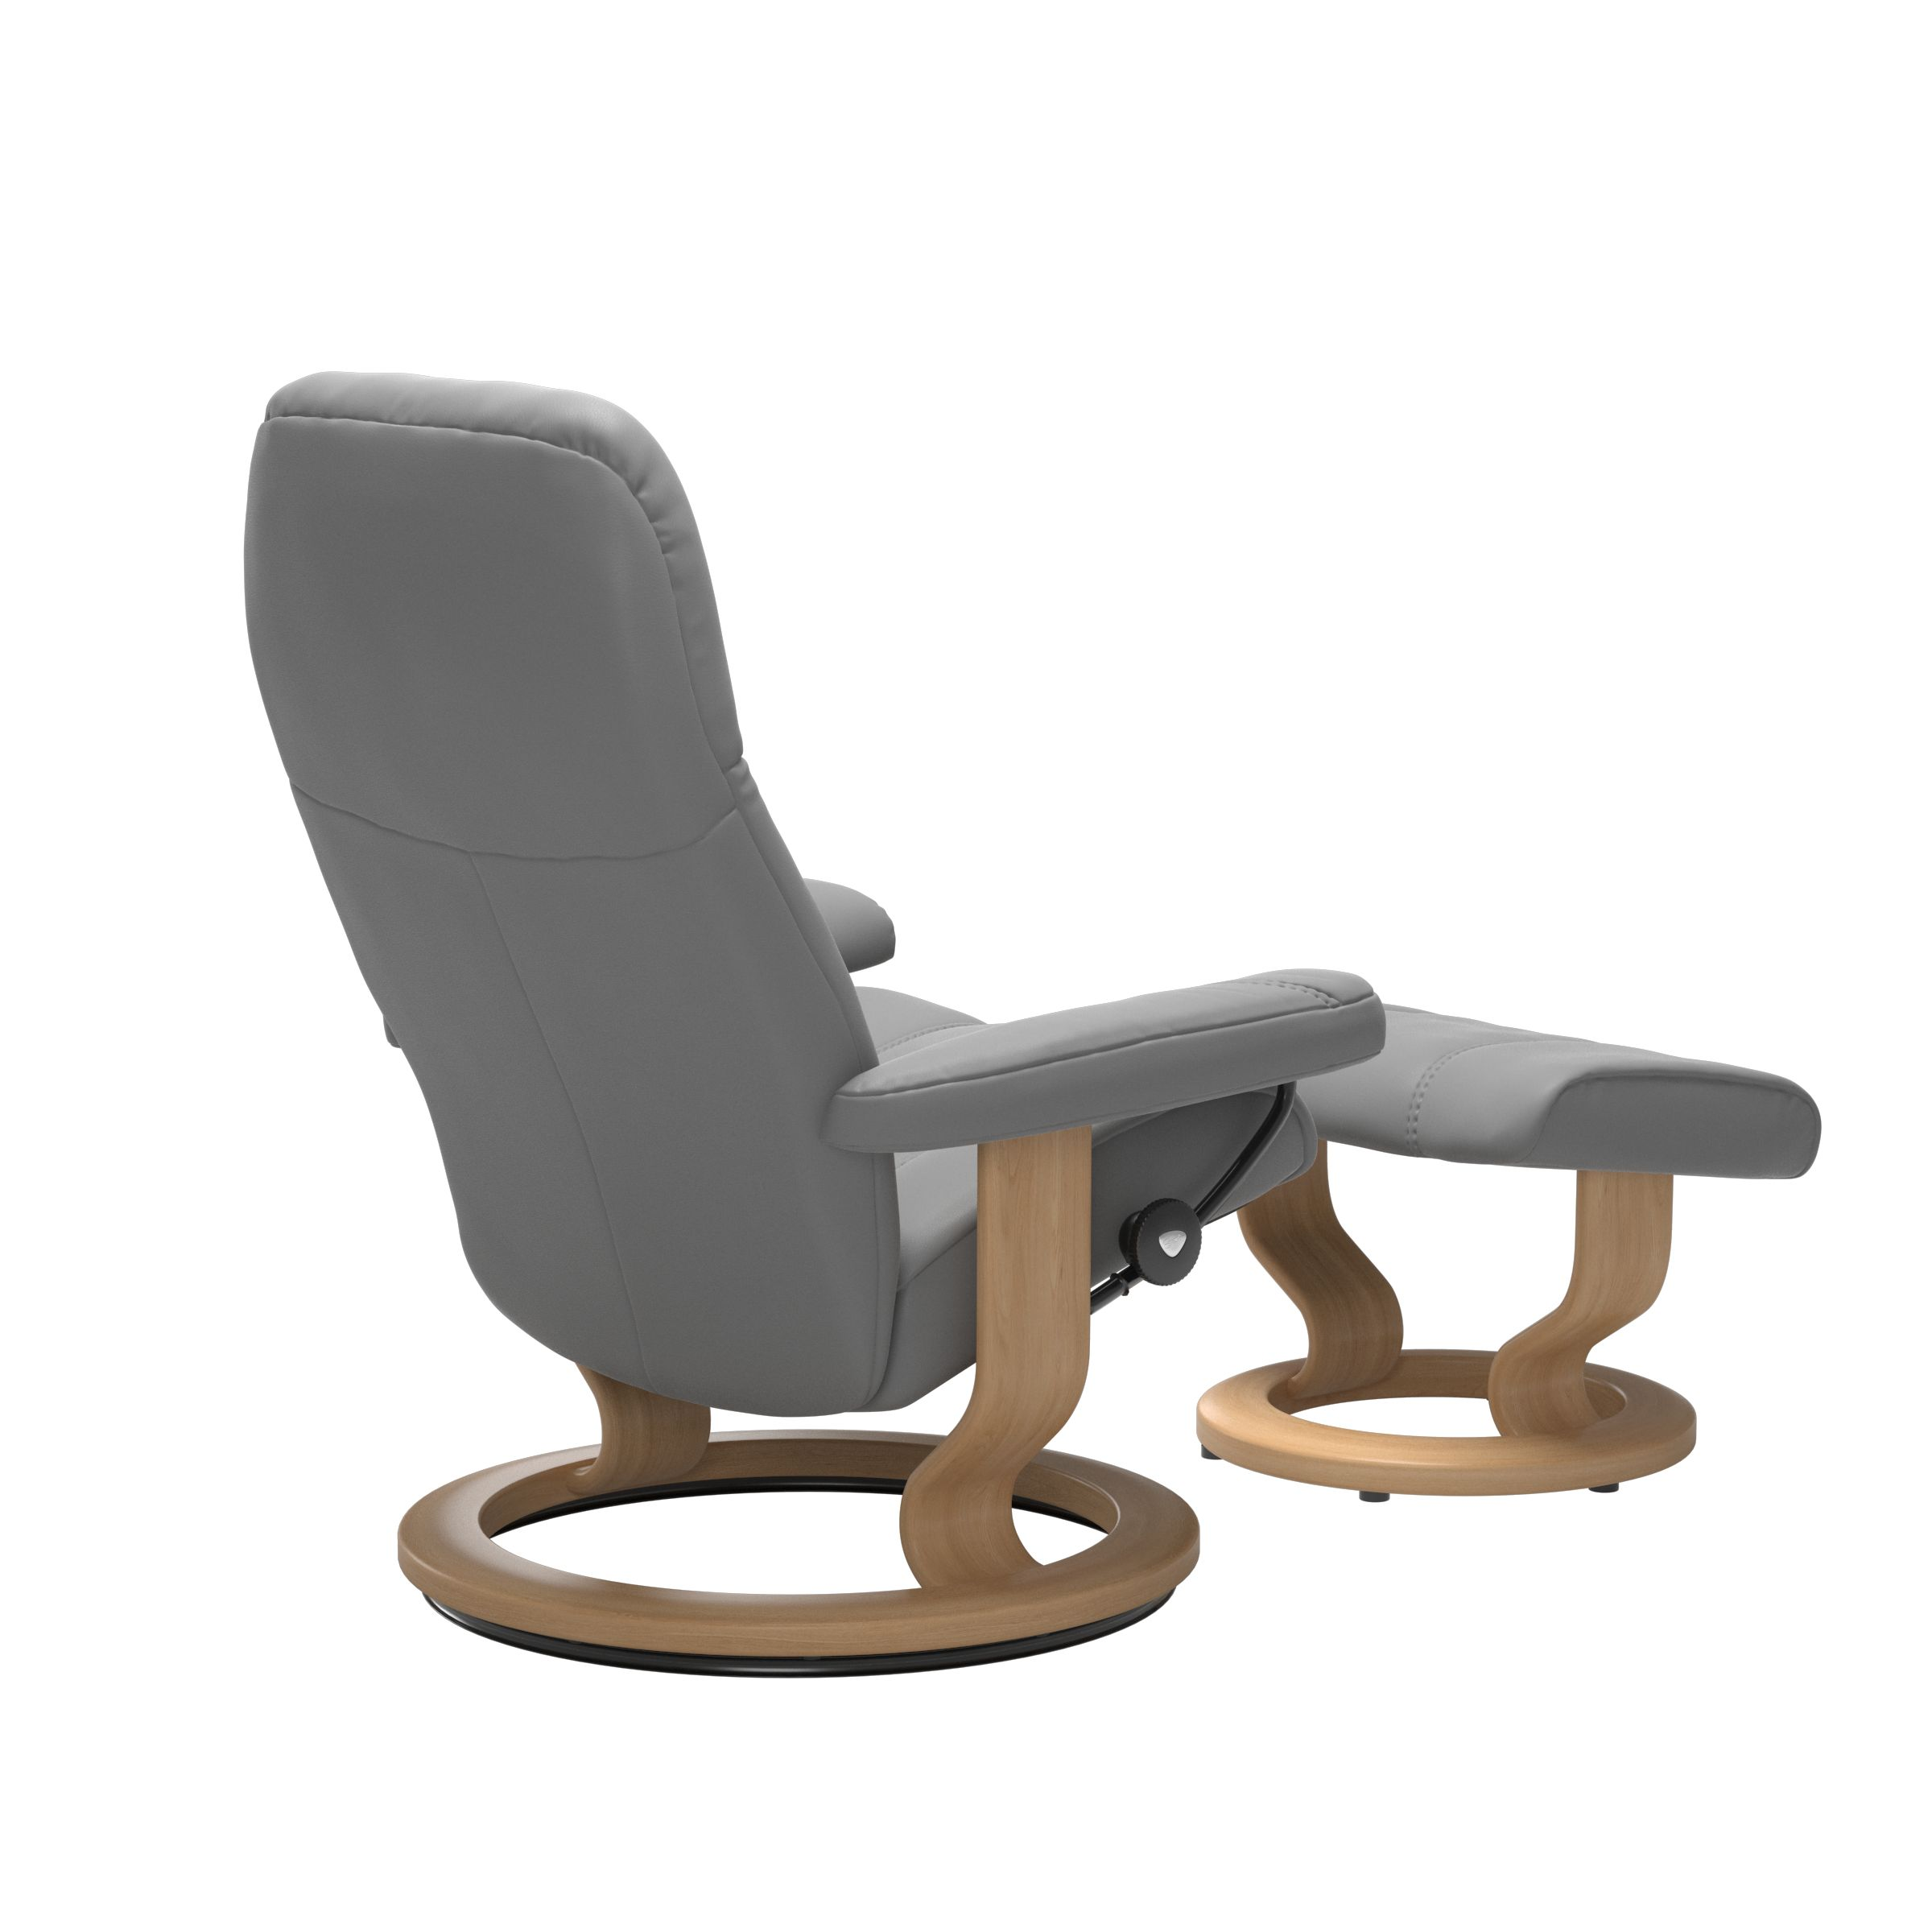 Stressless Consul Wild Dove Medium Recliner Chair